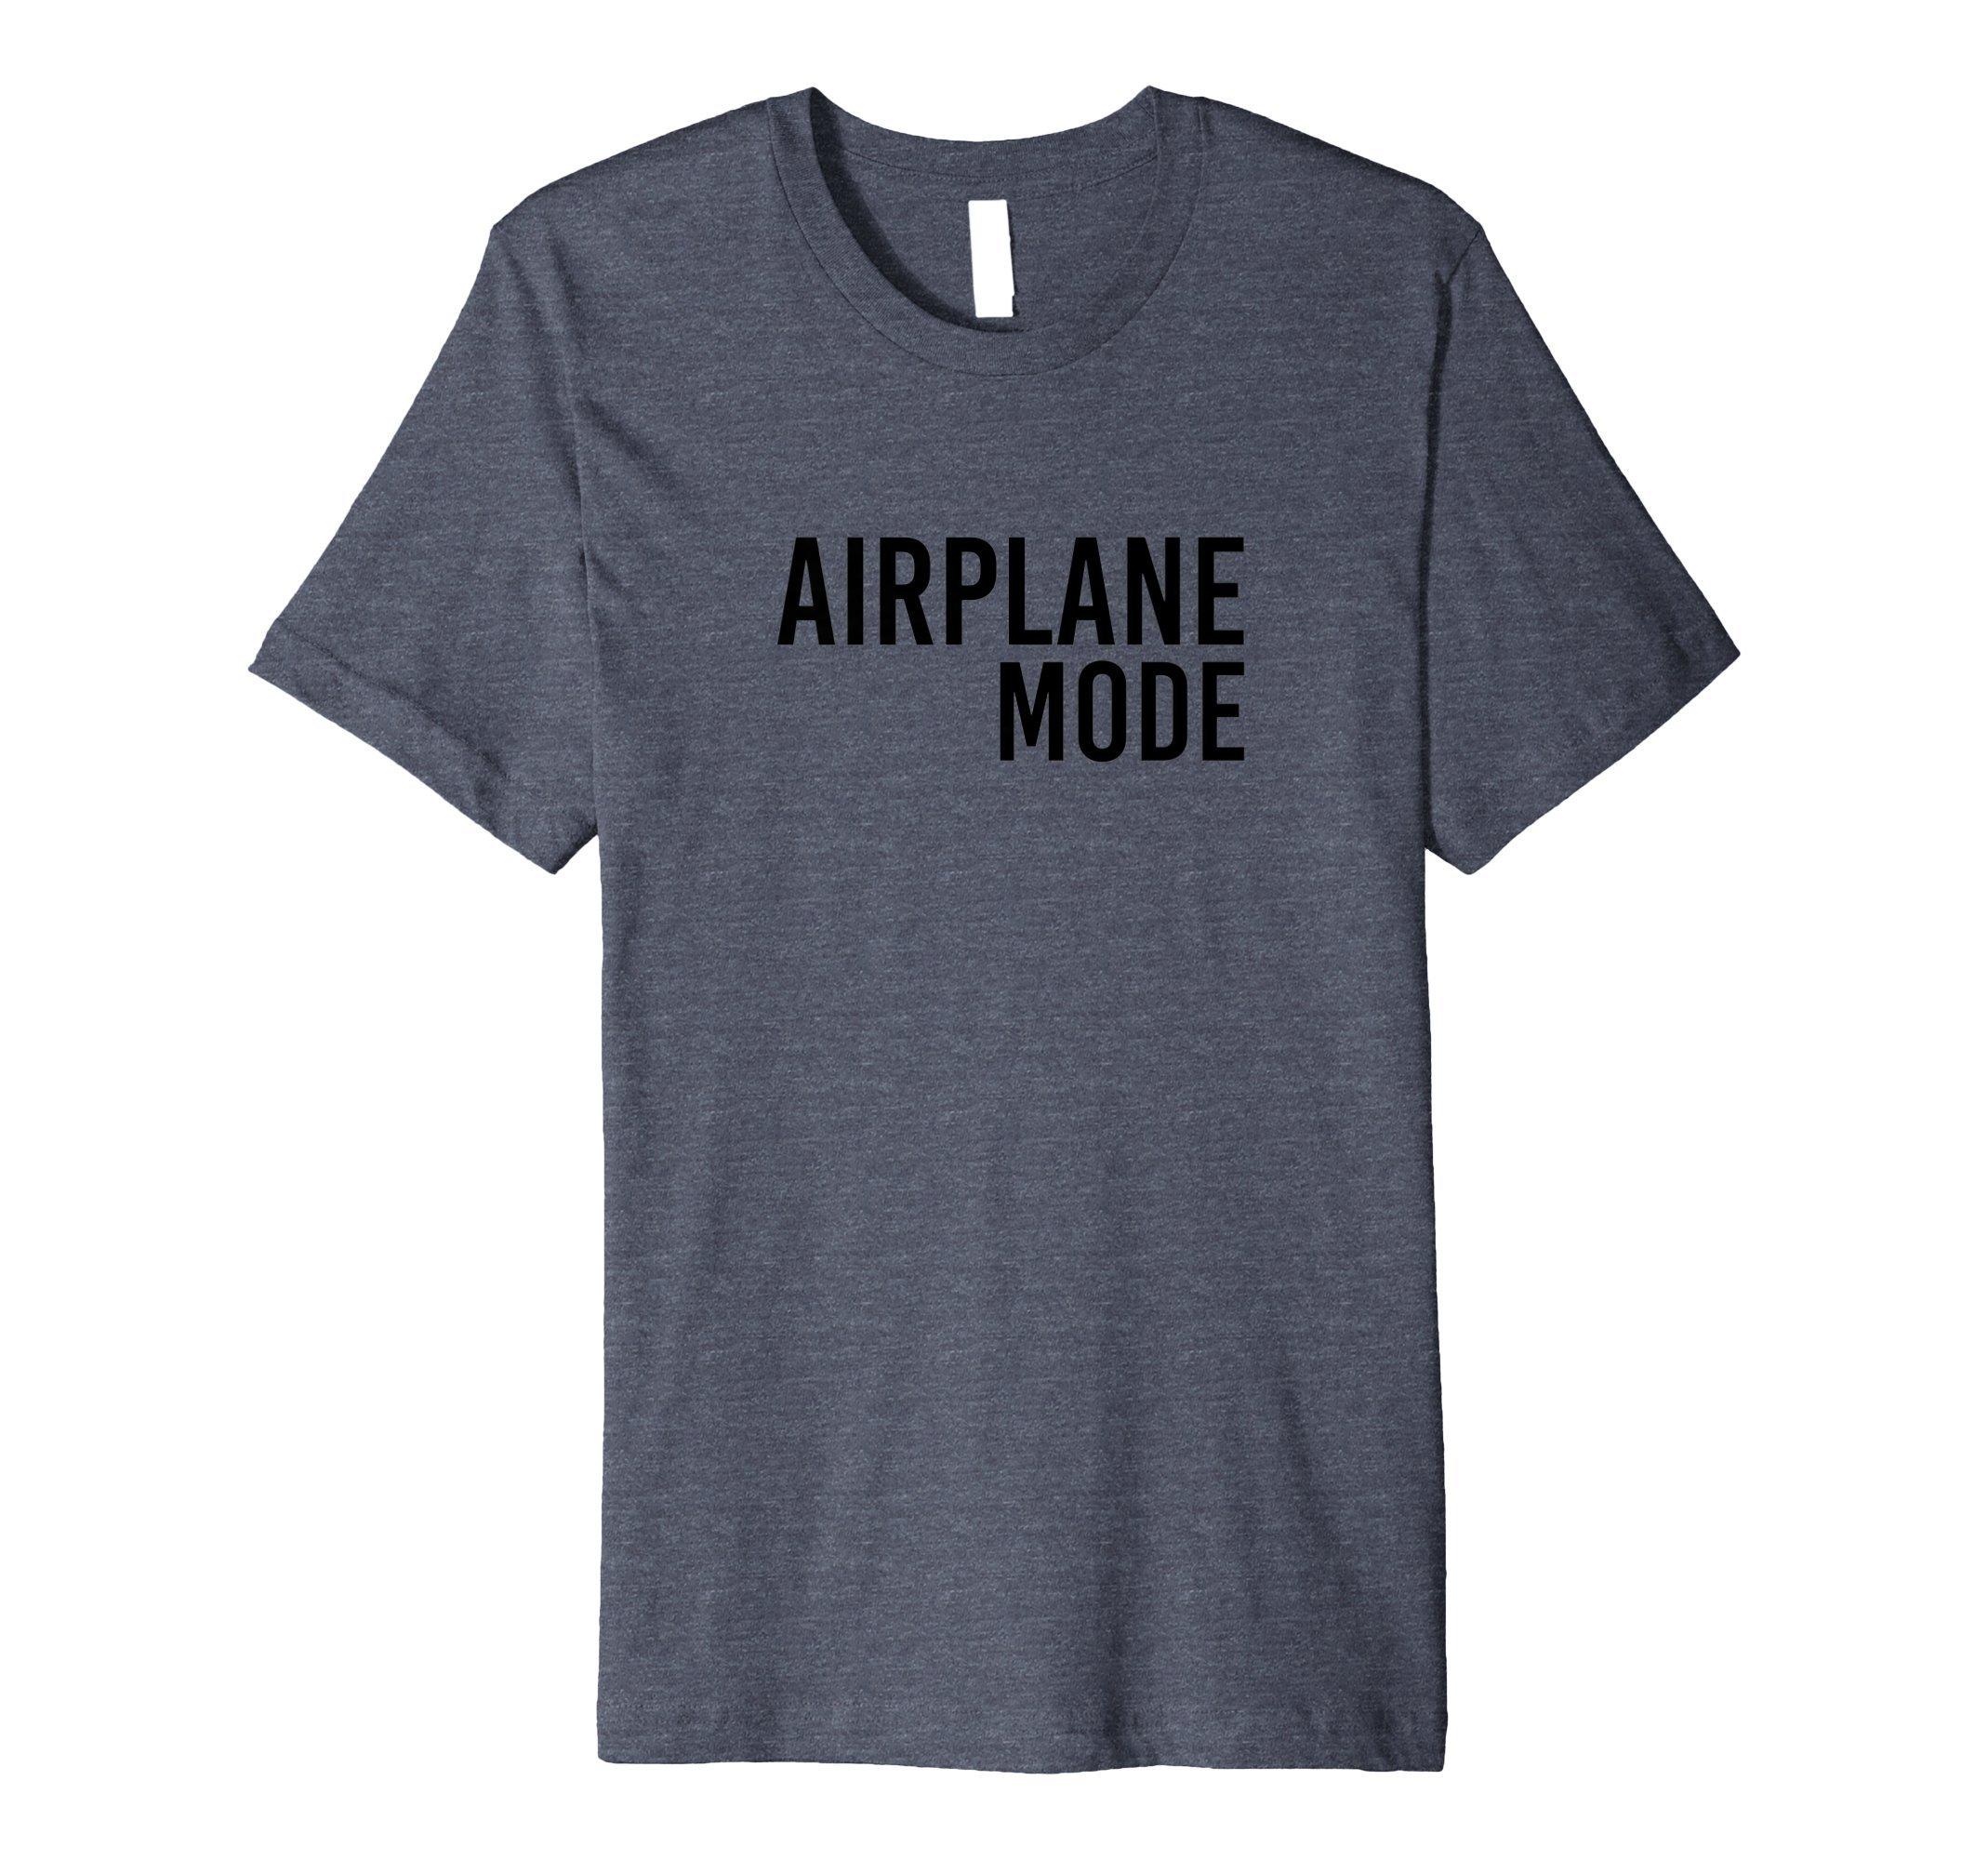 Mens Airplane Mode T-Shirt - Premium Travel Fashion Tee XL Heather Blue